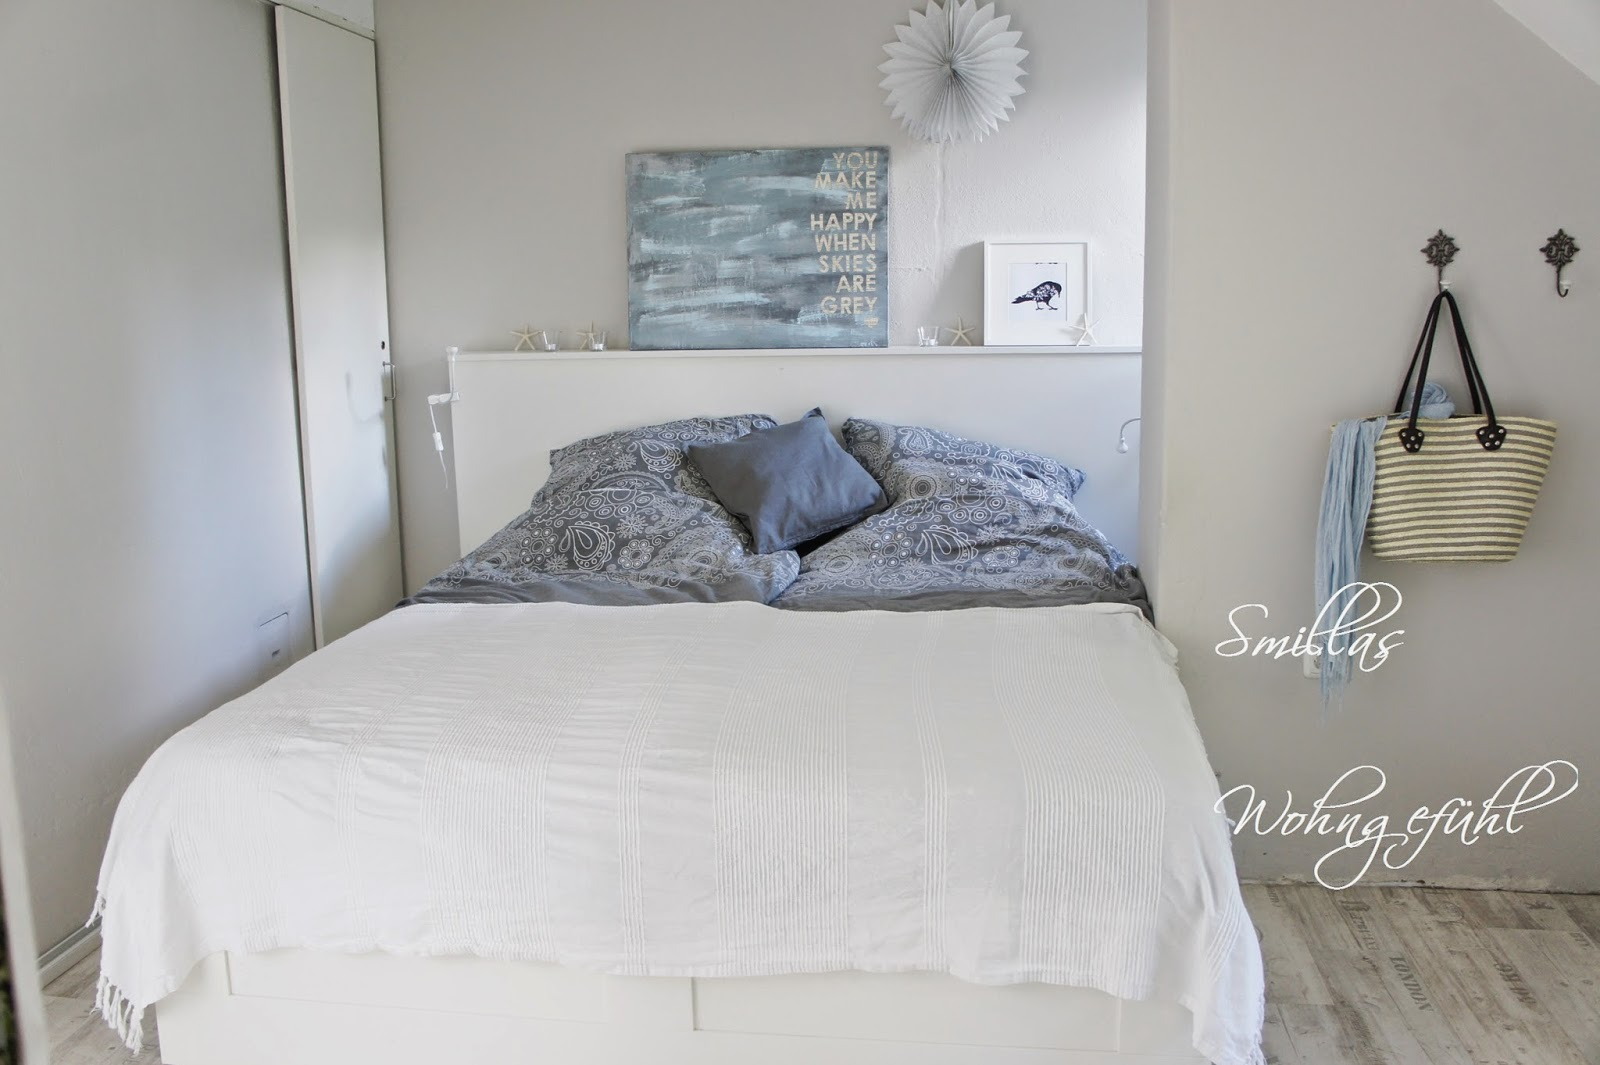 smillas wohngef hl schlafzimmerblick. Black Bedroom Furniture Sets. Home Design Ideas